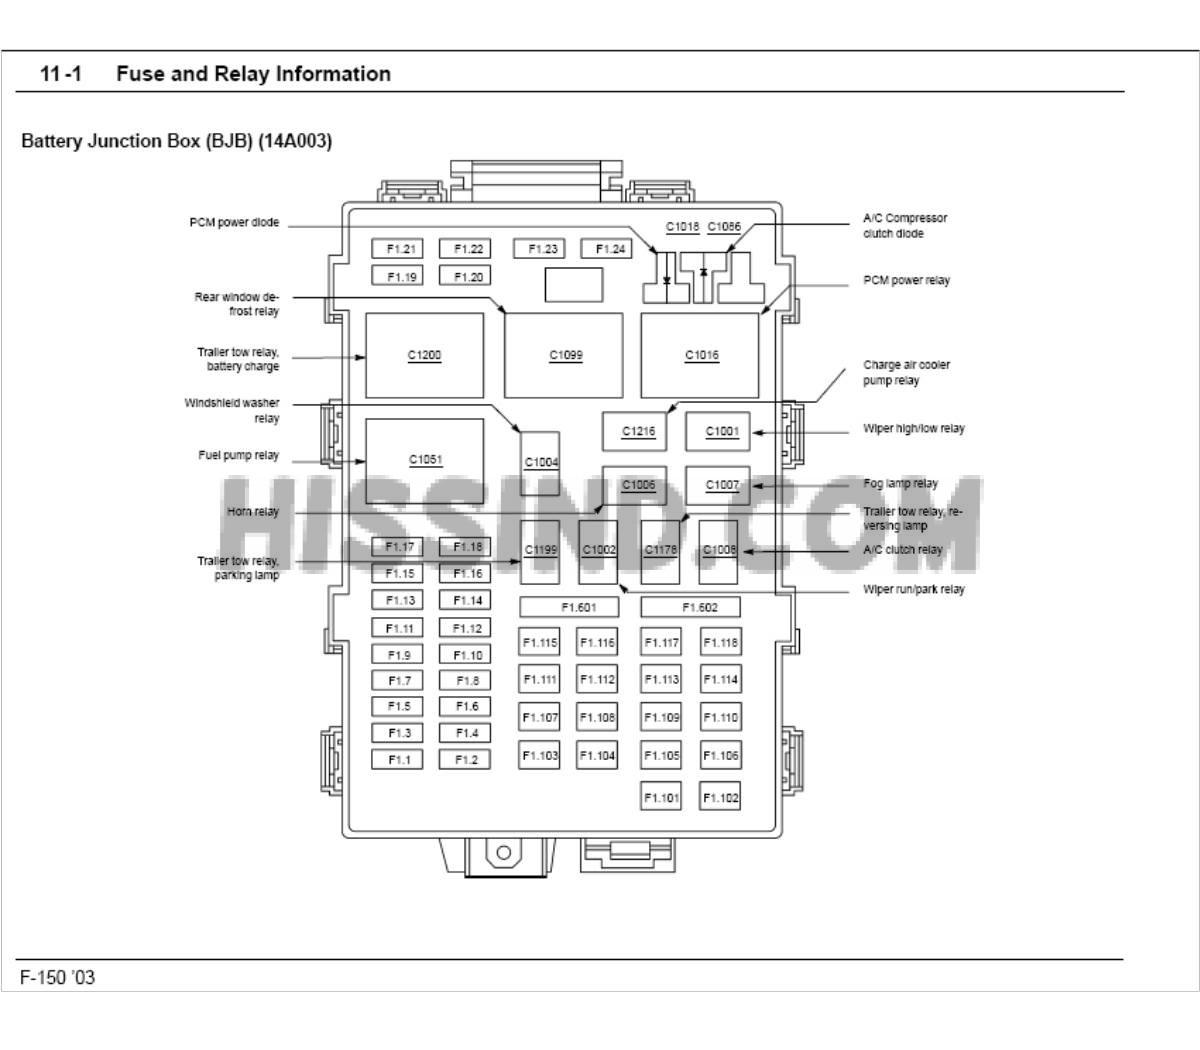 2002 F250 Fuse Box Engine Complete Wiring Diagrams 04 2004 Diagram Enthusiast U2022 Rh Rasalibre Co 2000